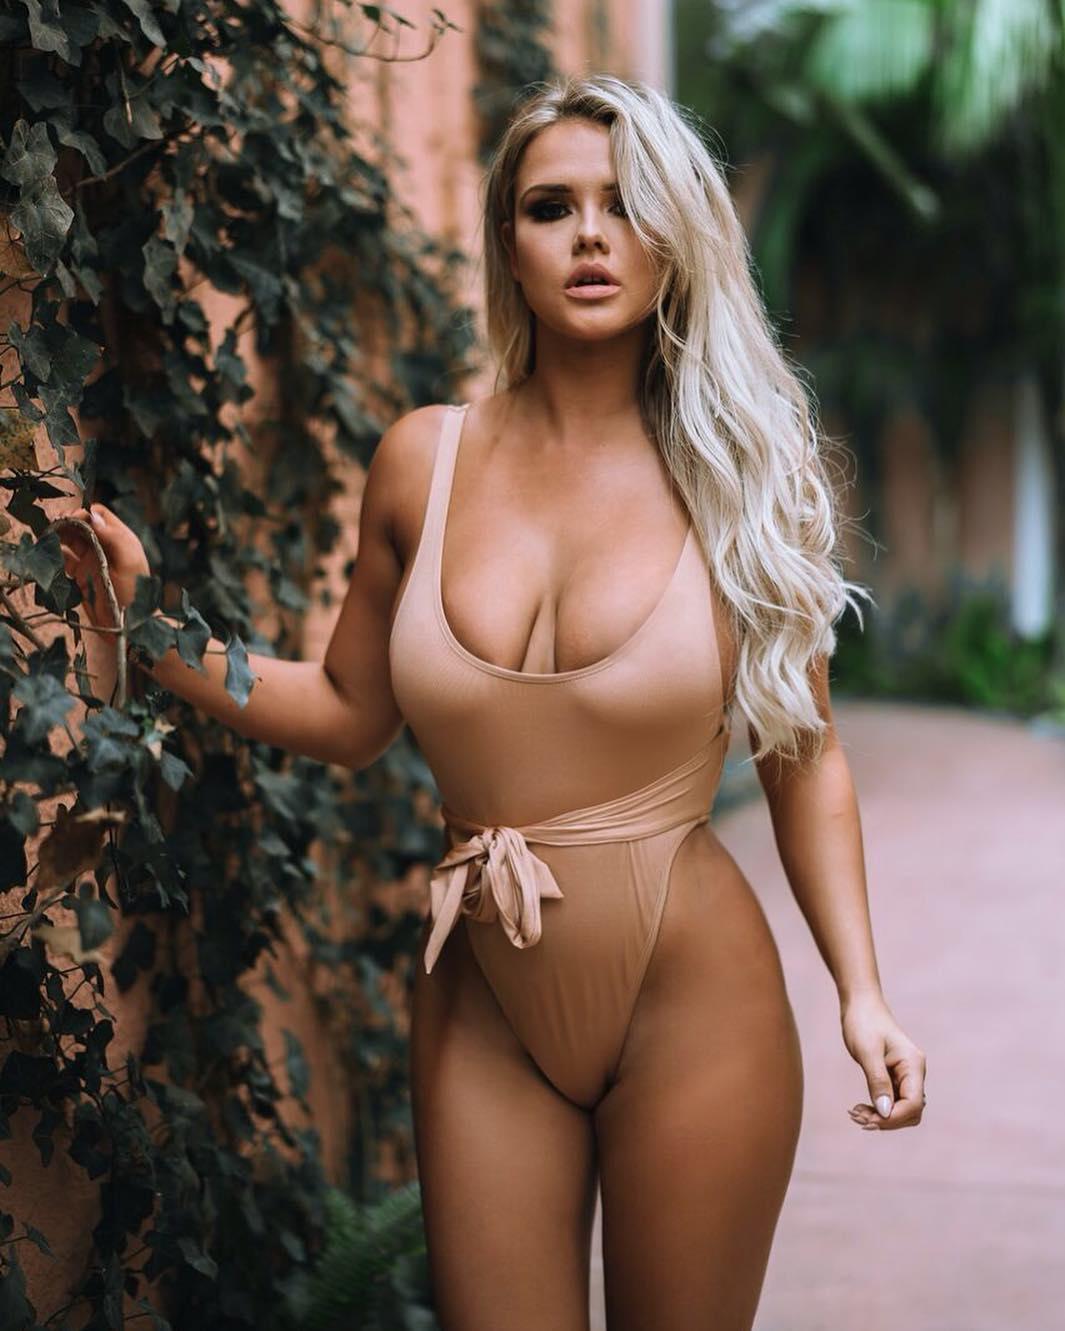 Images Puma Swede nudes (46 photo), Tits, Sideboobs, Instagram, underwear 2006